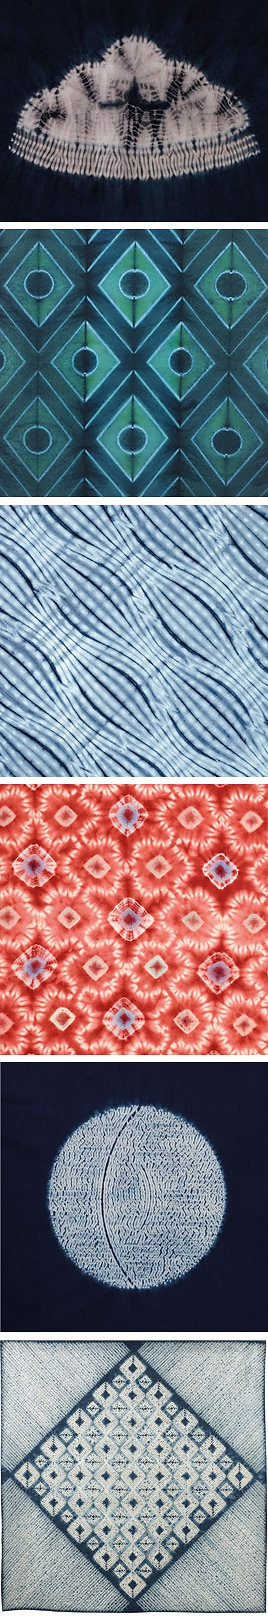 Jane Callender Textiles